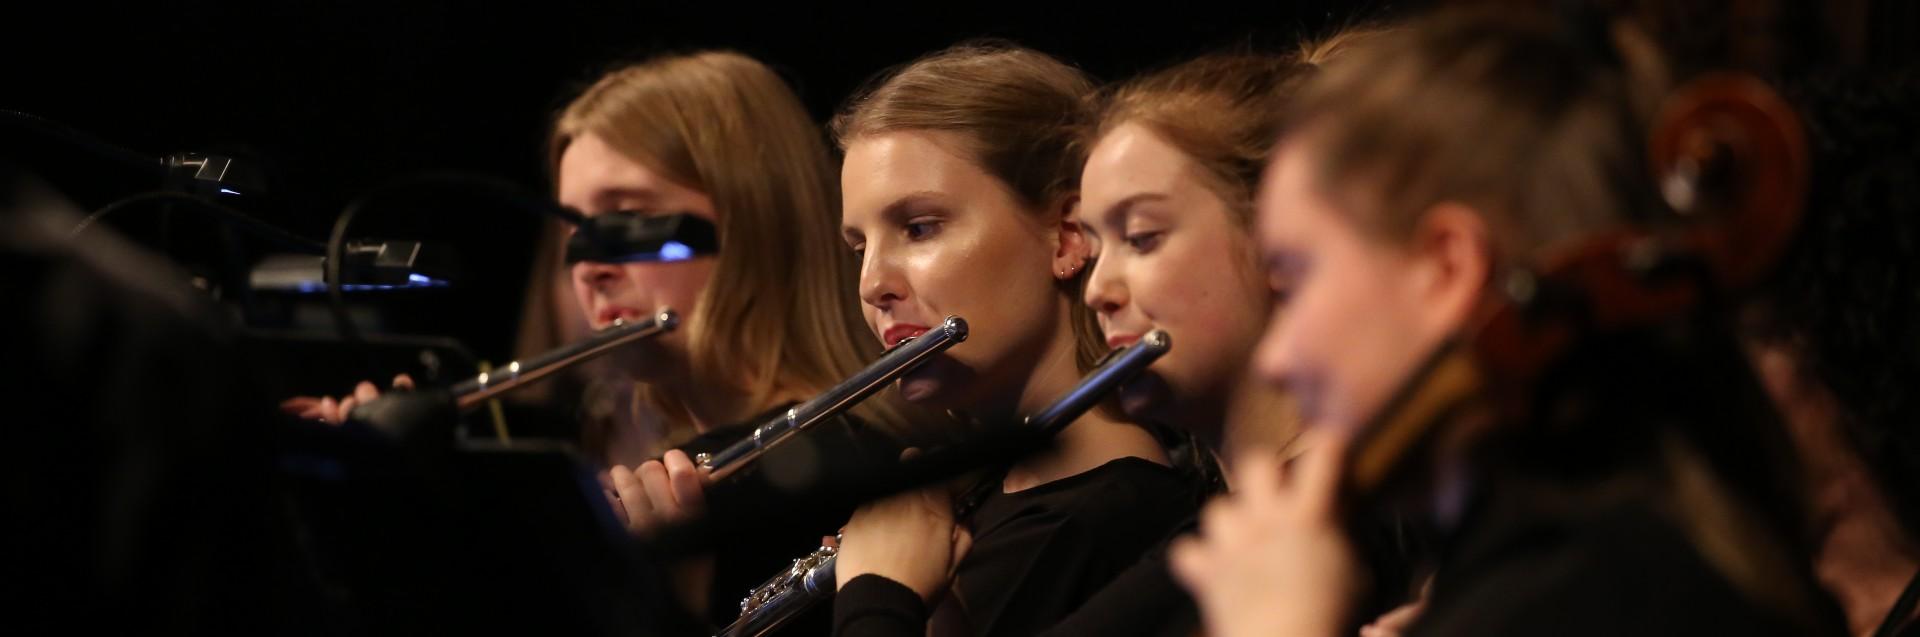 Fløytestudenter på Universitetets julekonsert 2019. Foto: Olav Bjånes.